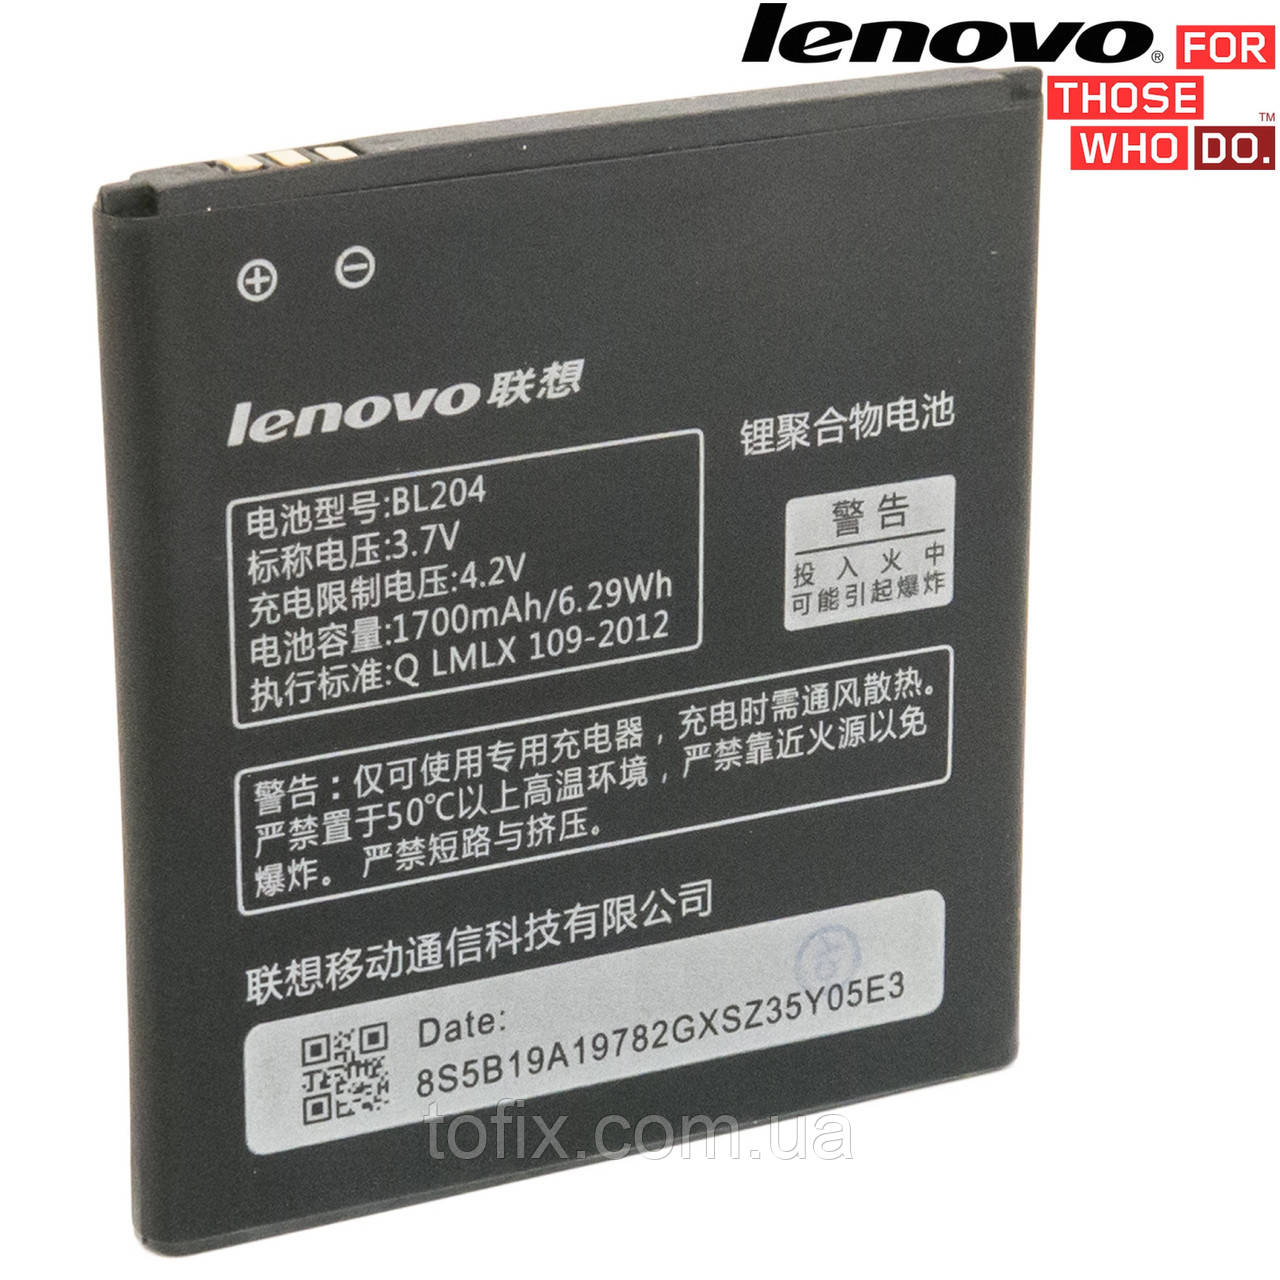 Батарея (акб, аккумулятор) BL204 для Lenovo S696 IdeaPhone, 1700 mAh, оригинал